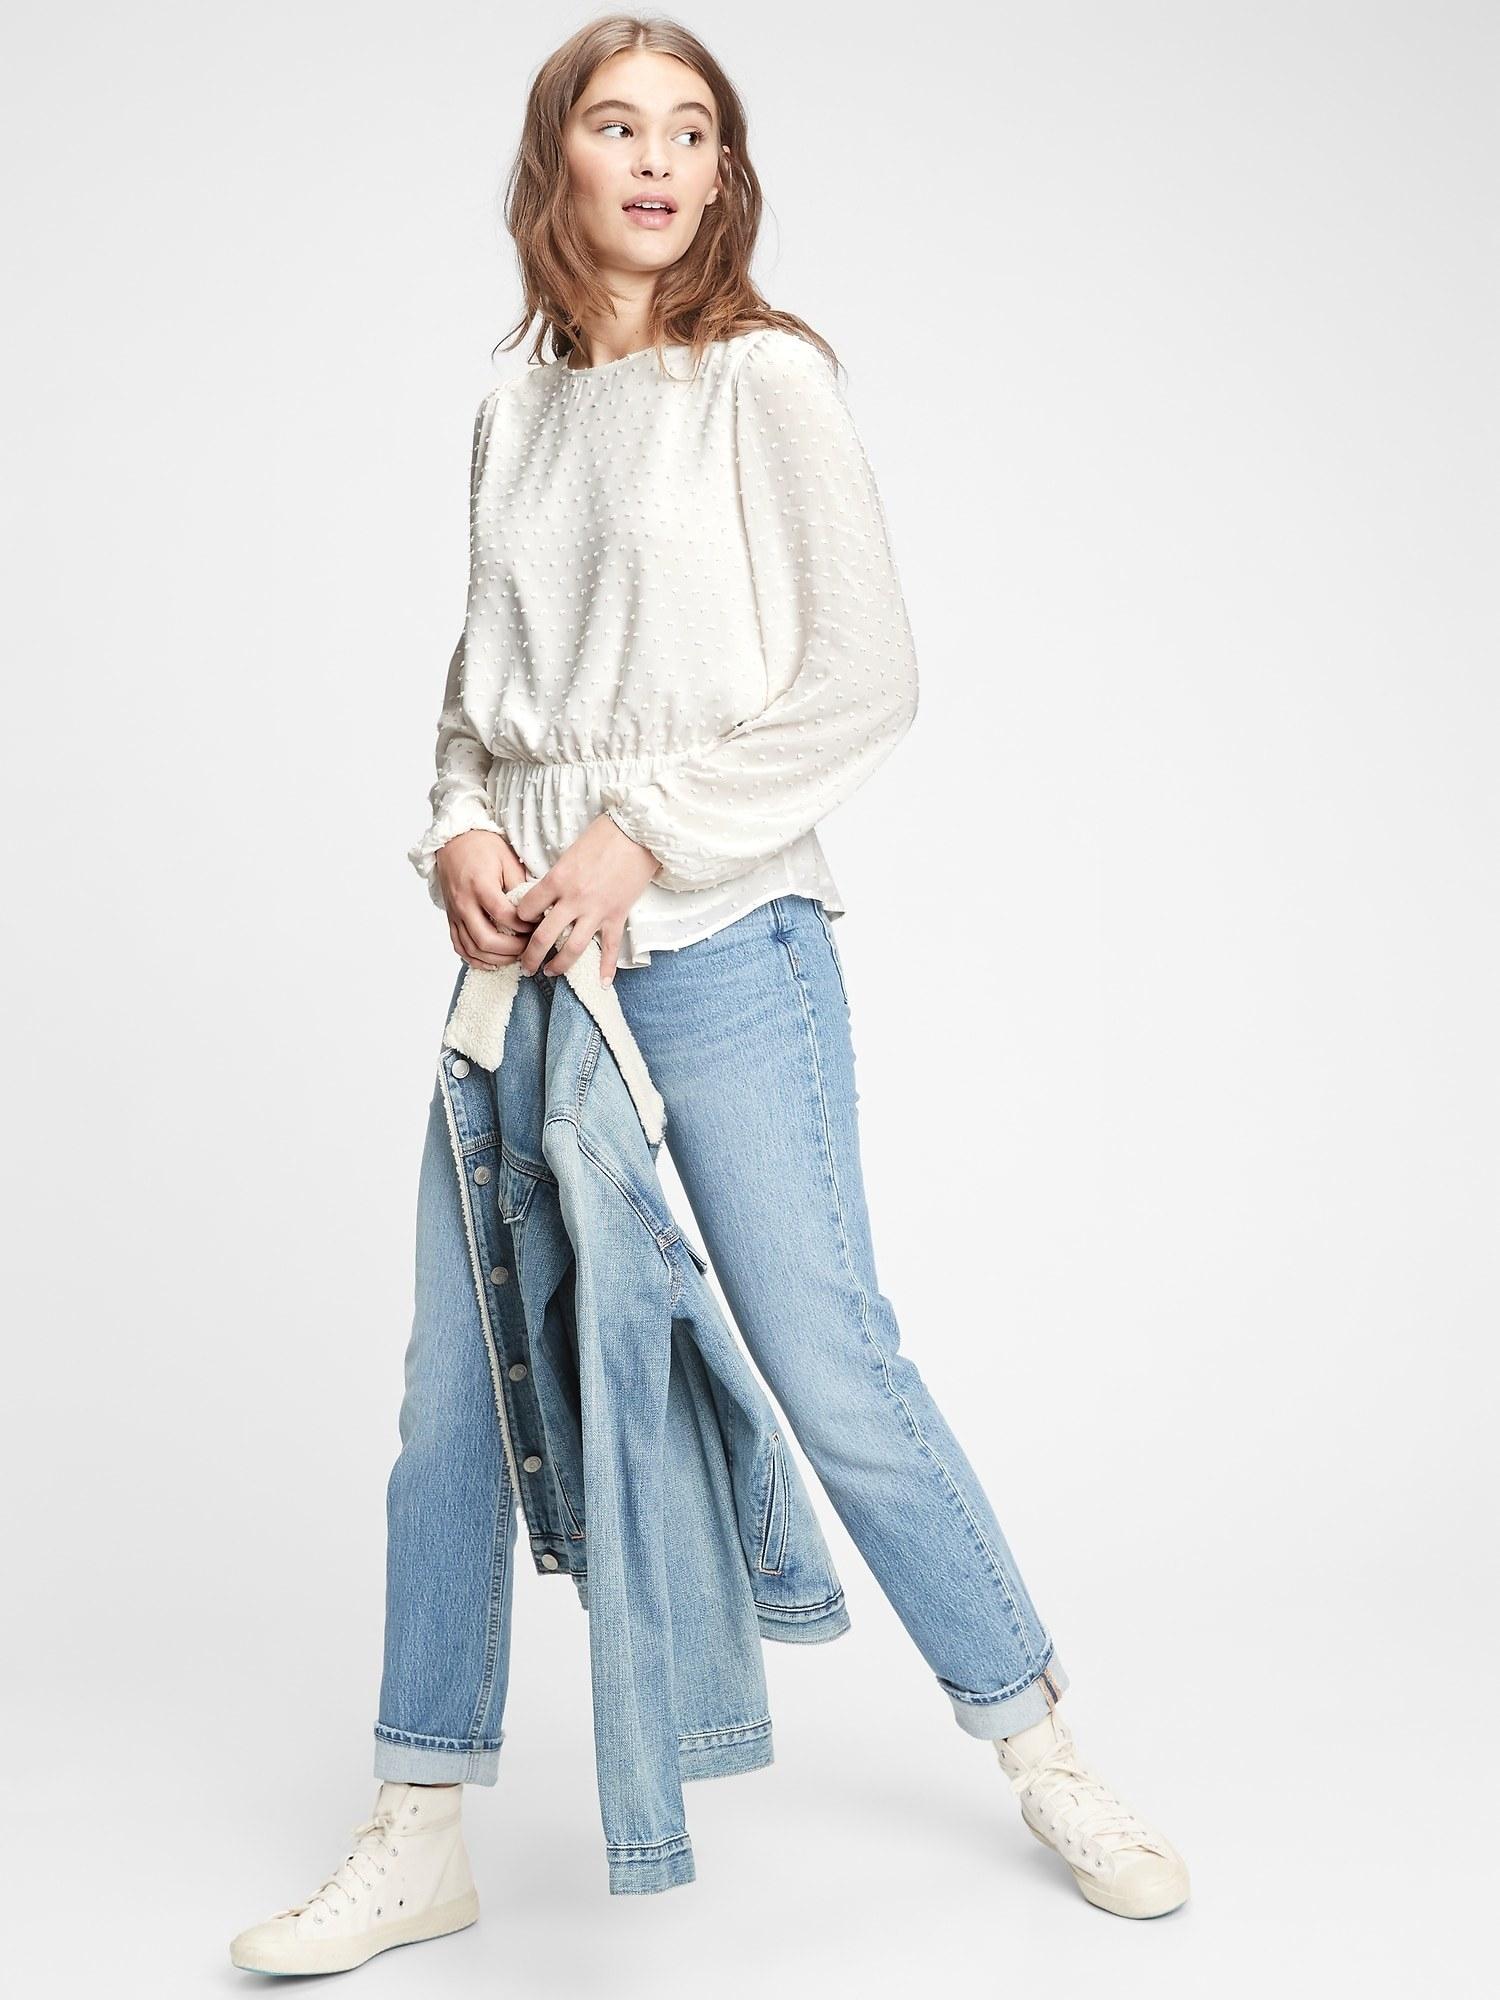 Model wearing peplum top